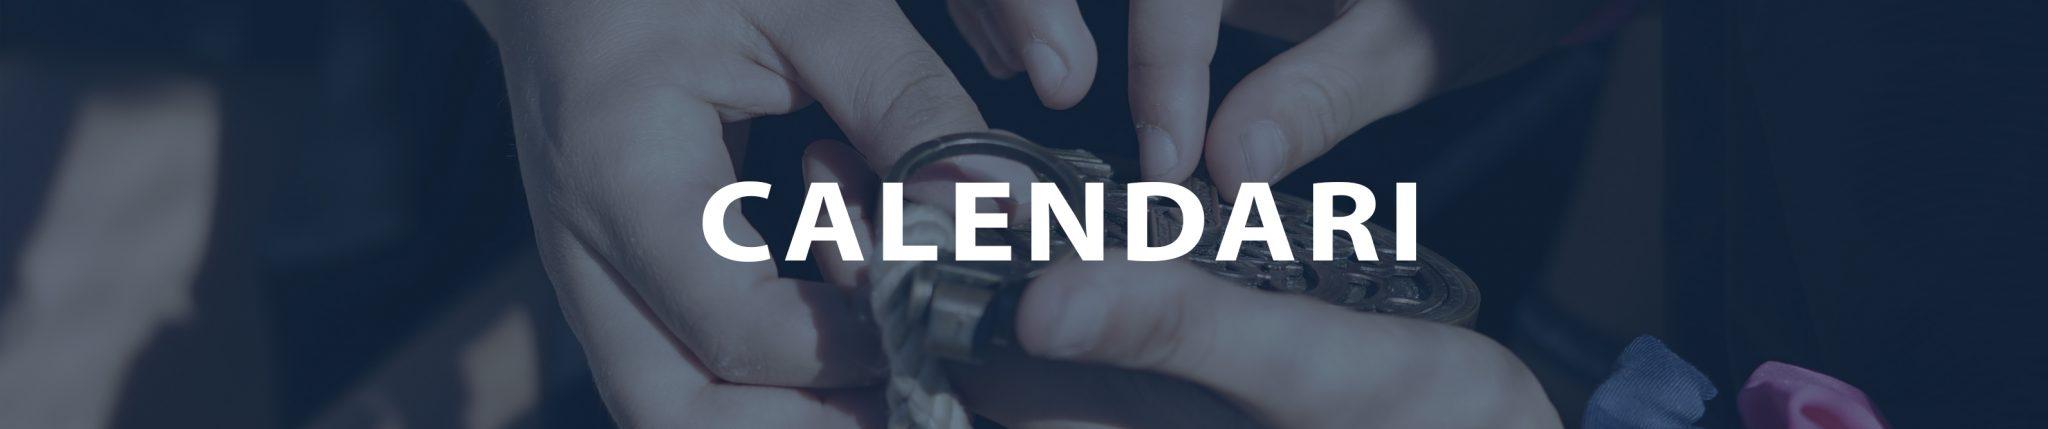 activitat - calendari - Siurana